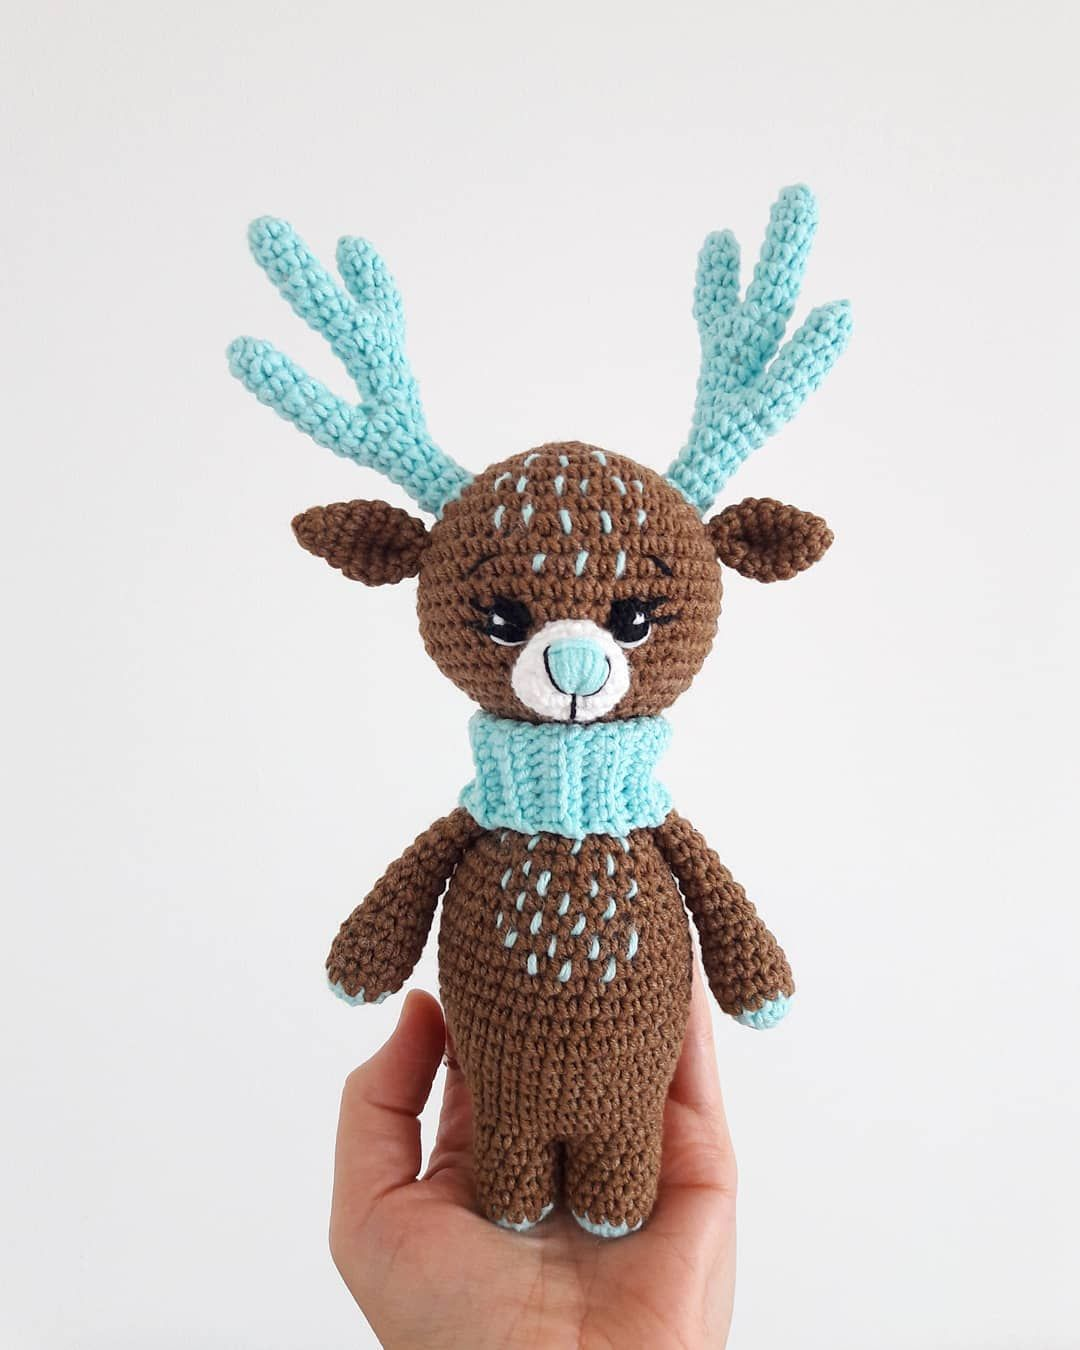 Amigurumi Doll Pacifier Baby Free Crochet Pattern | Wzory ... | 1350x1080